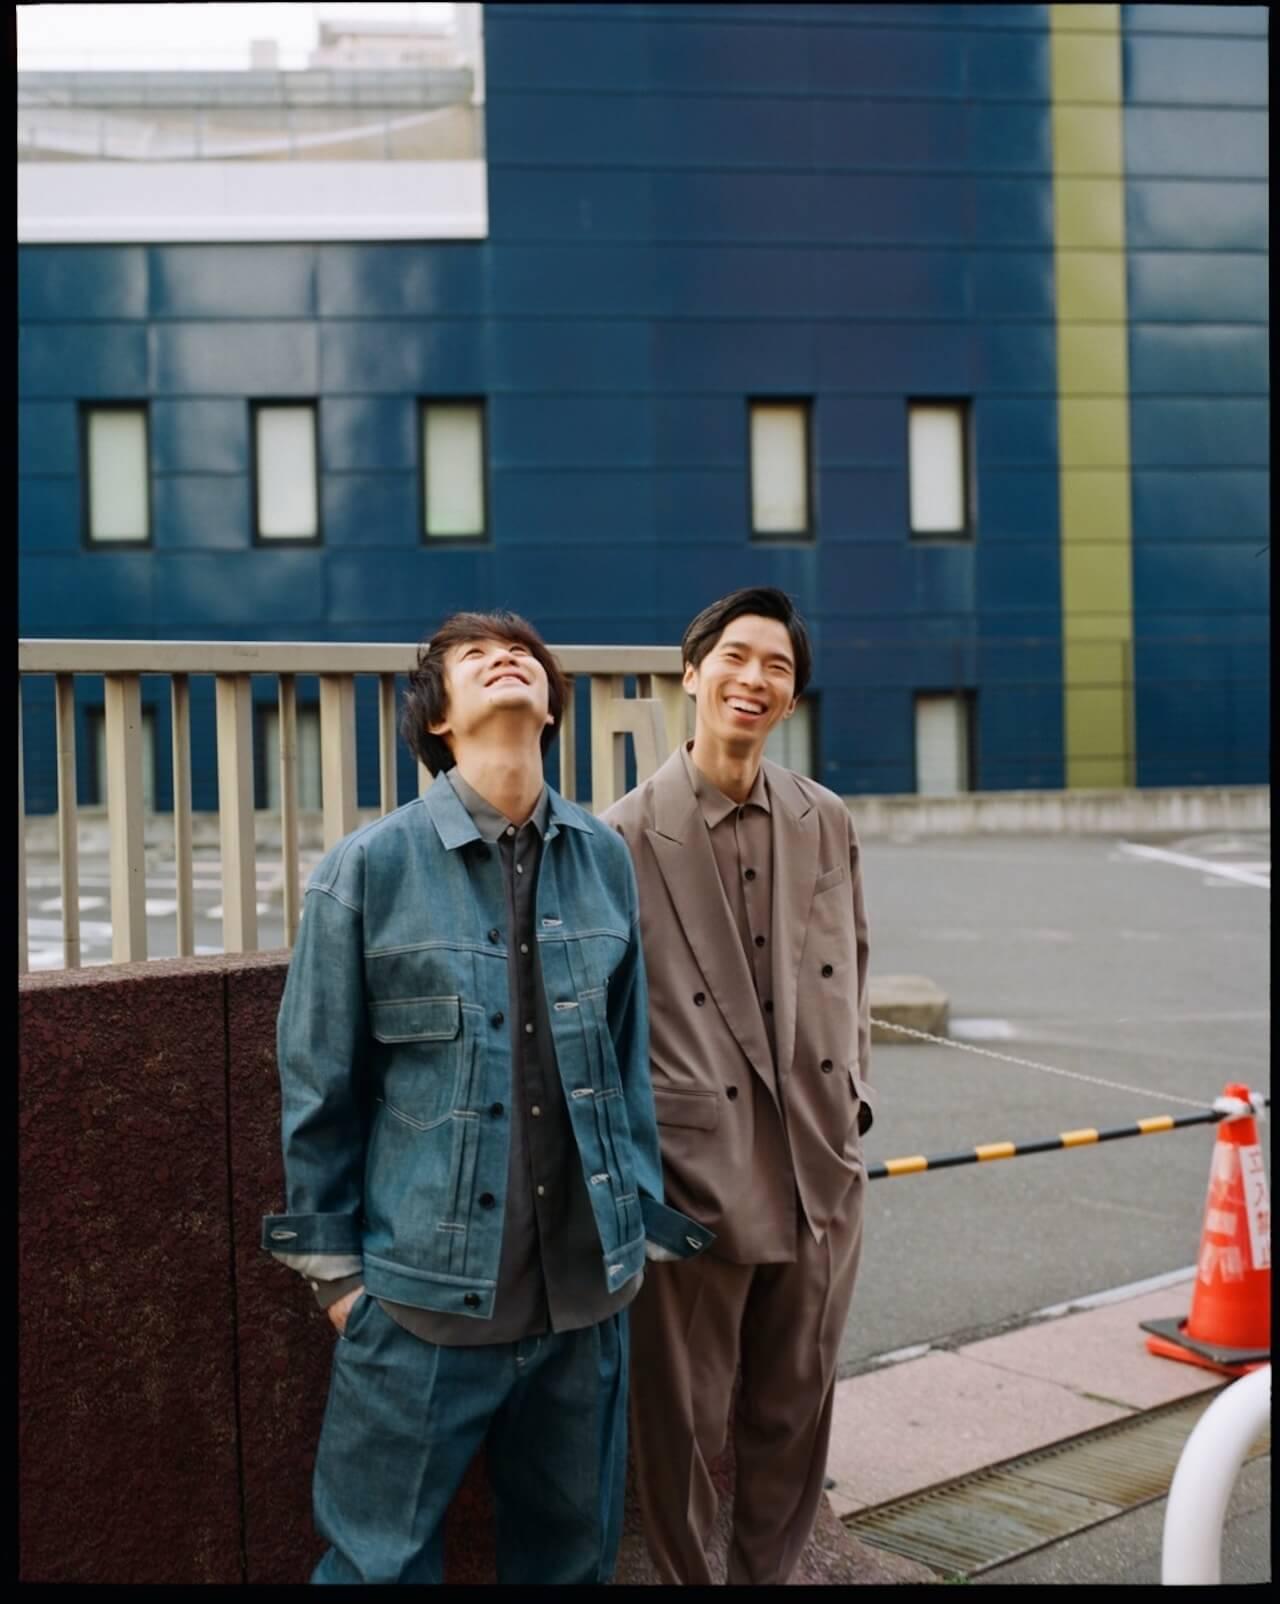 sunsite『Buenos!』──山本幹宗&永嶋柊吾による新バンドの「愛あるオマージュ」とまっすぐな姿勢 interview2105-sunsite-3